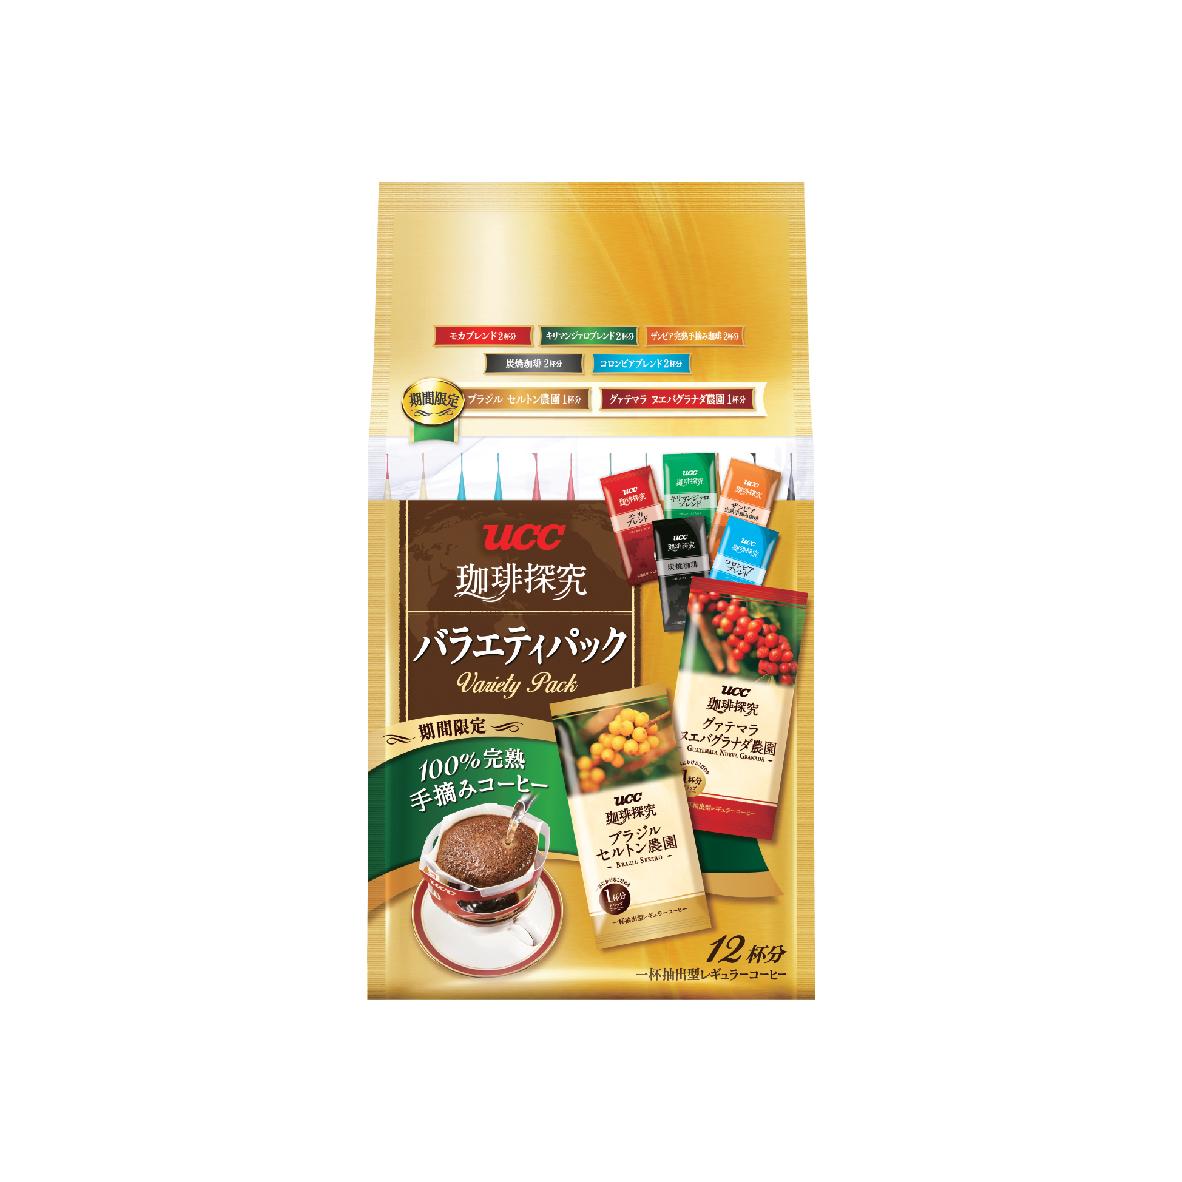 UCC Coffee Exploration Drip Coffee Variety Pack